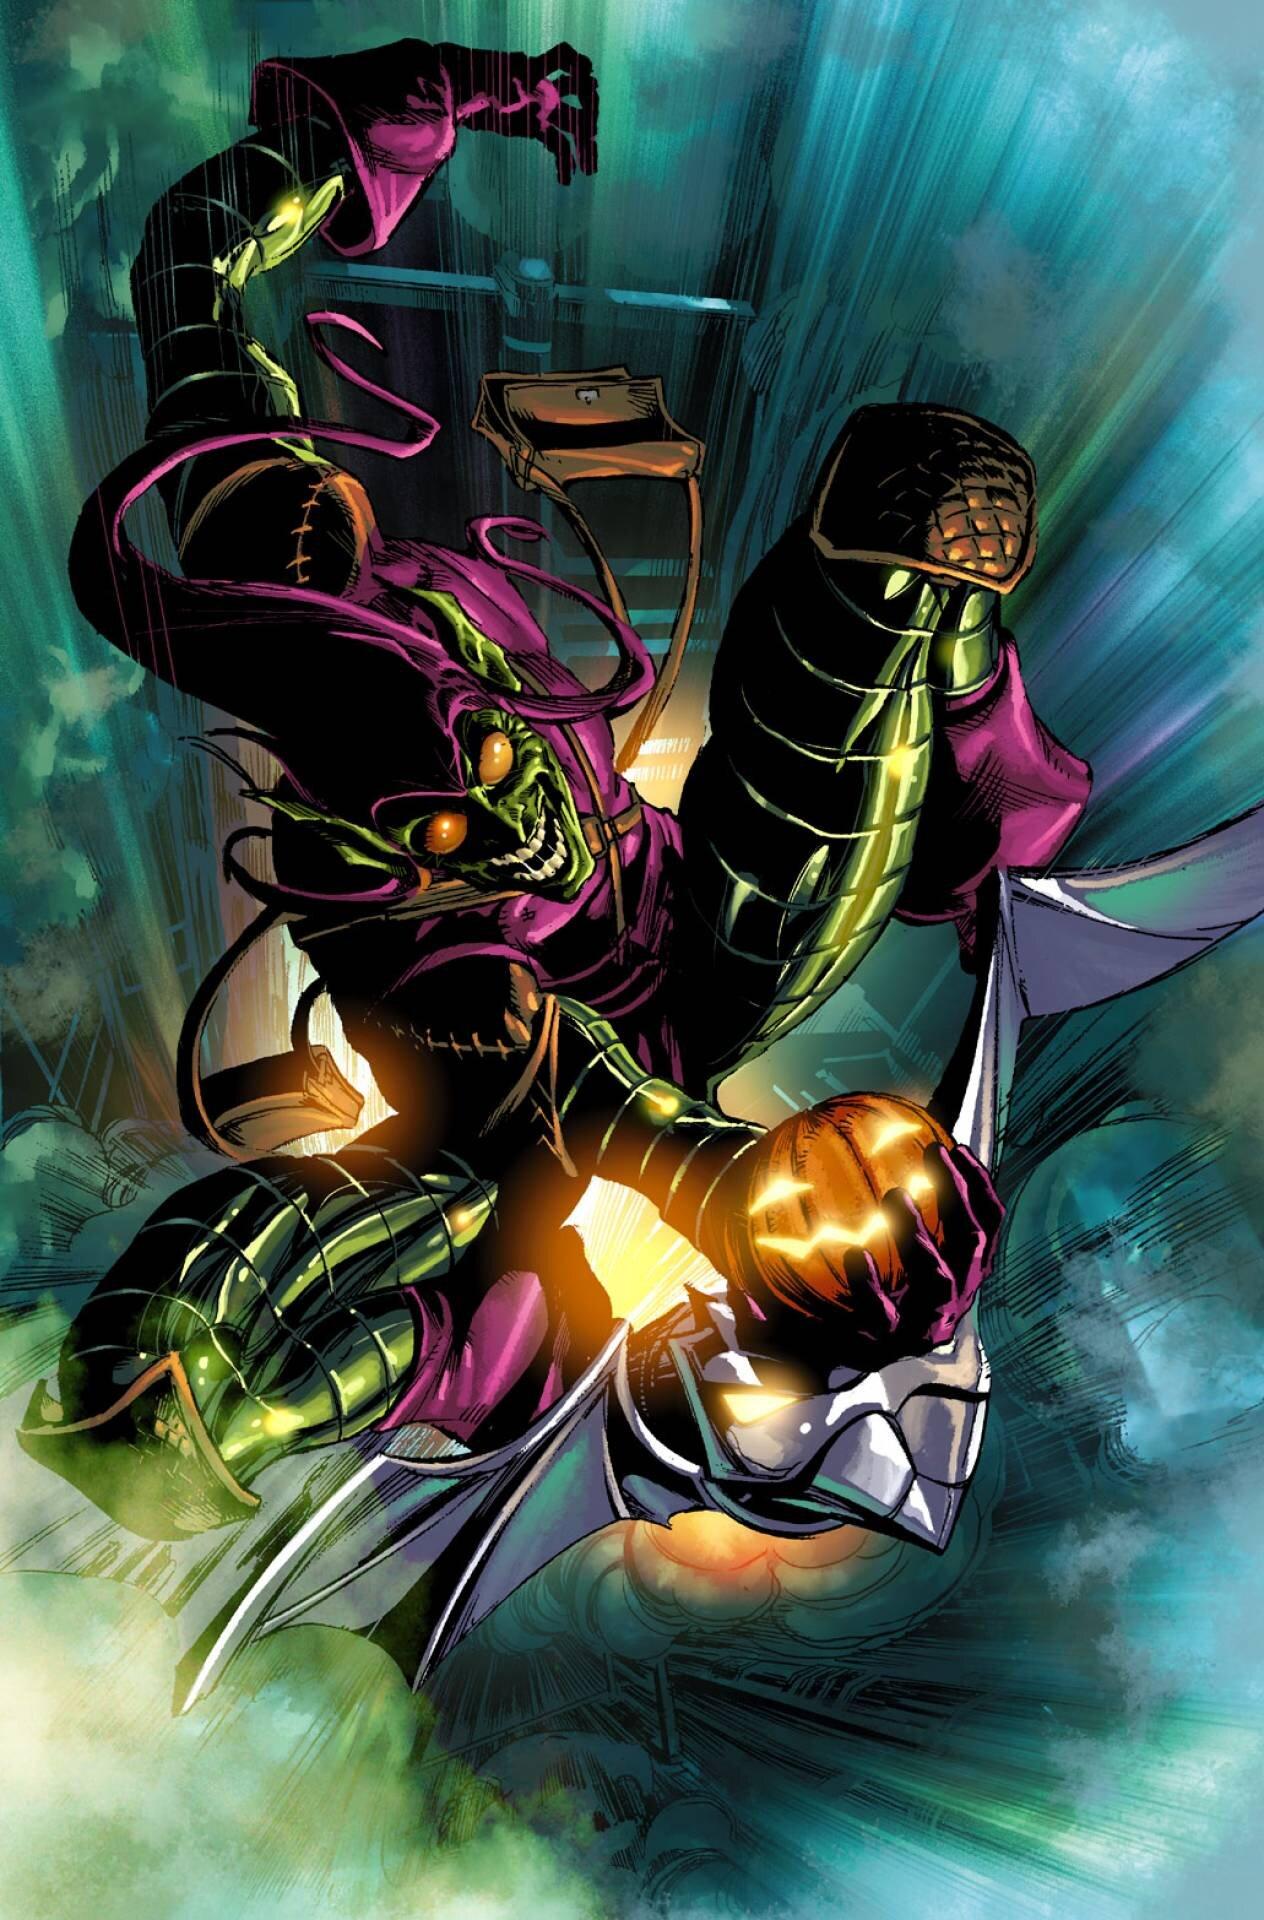 The Green Goblin — The Marvelous House of Ideas